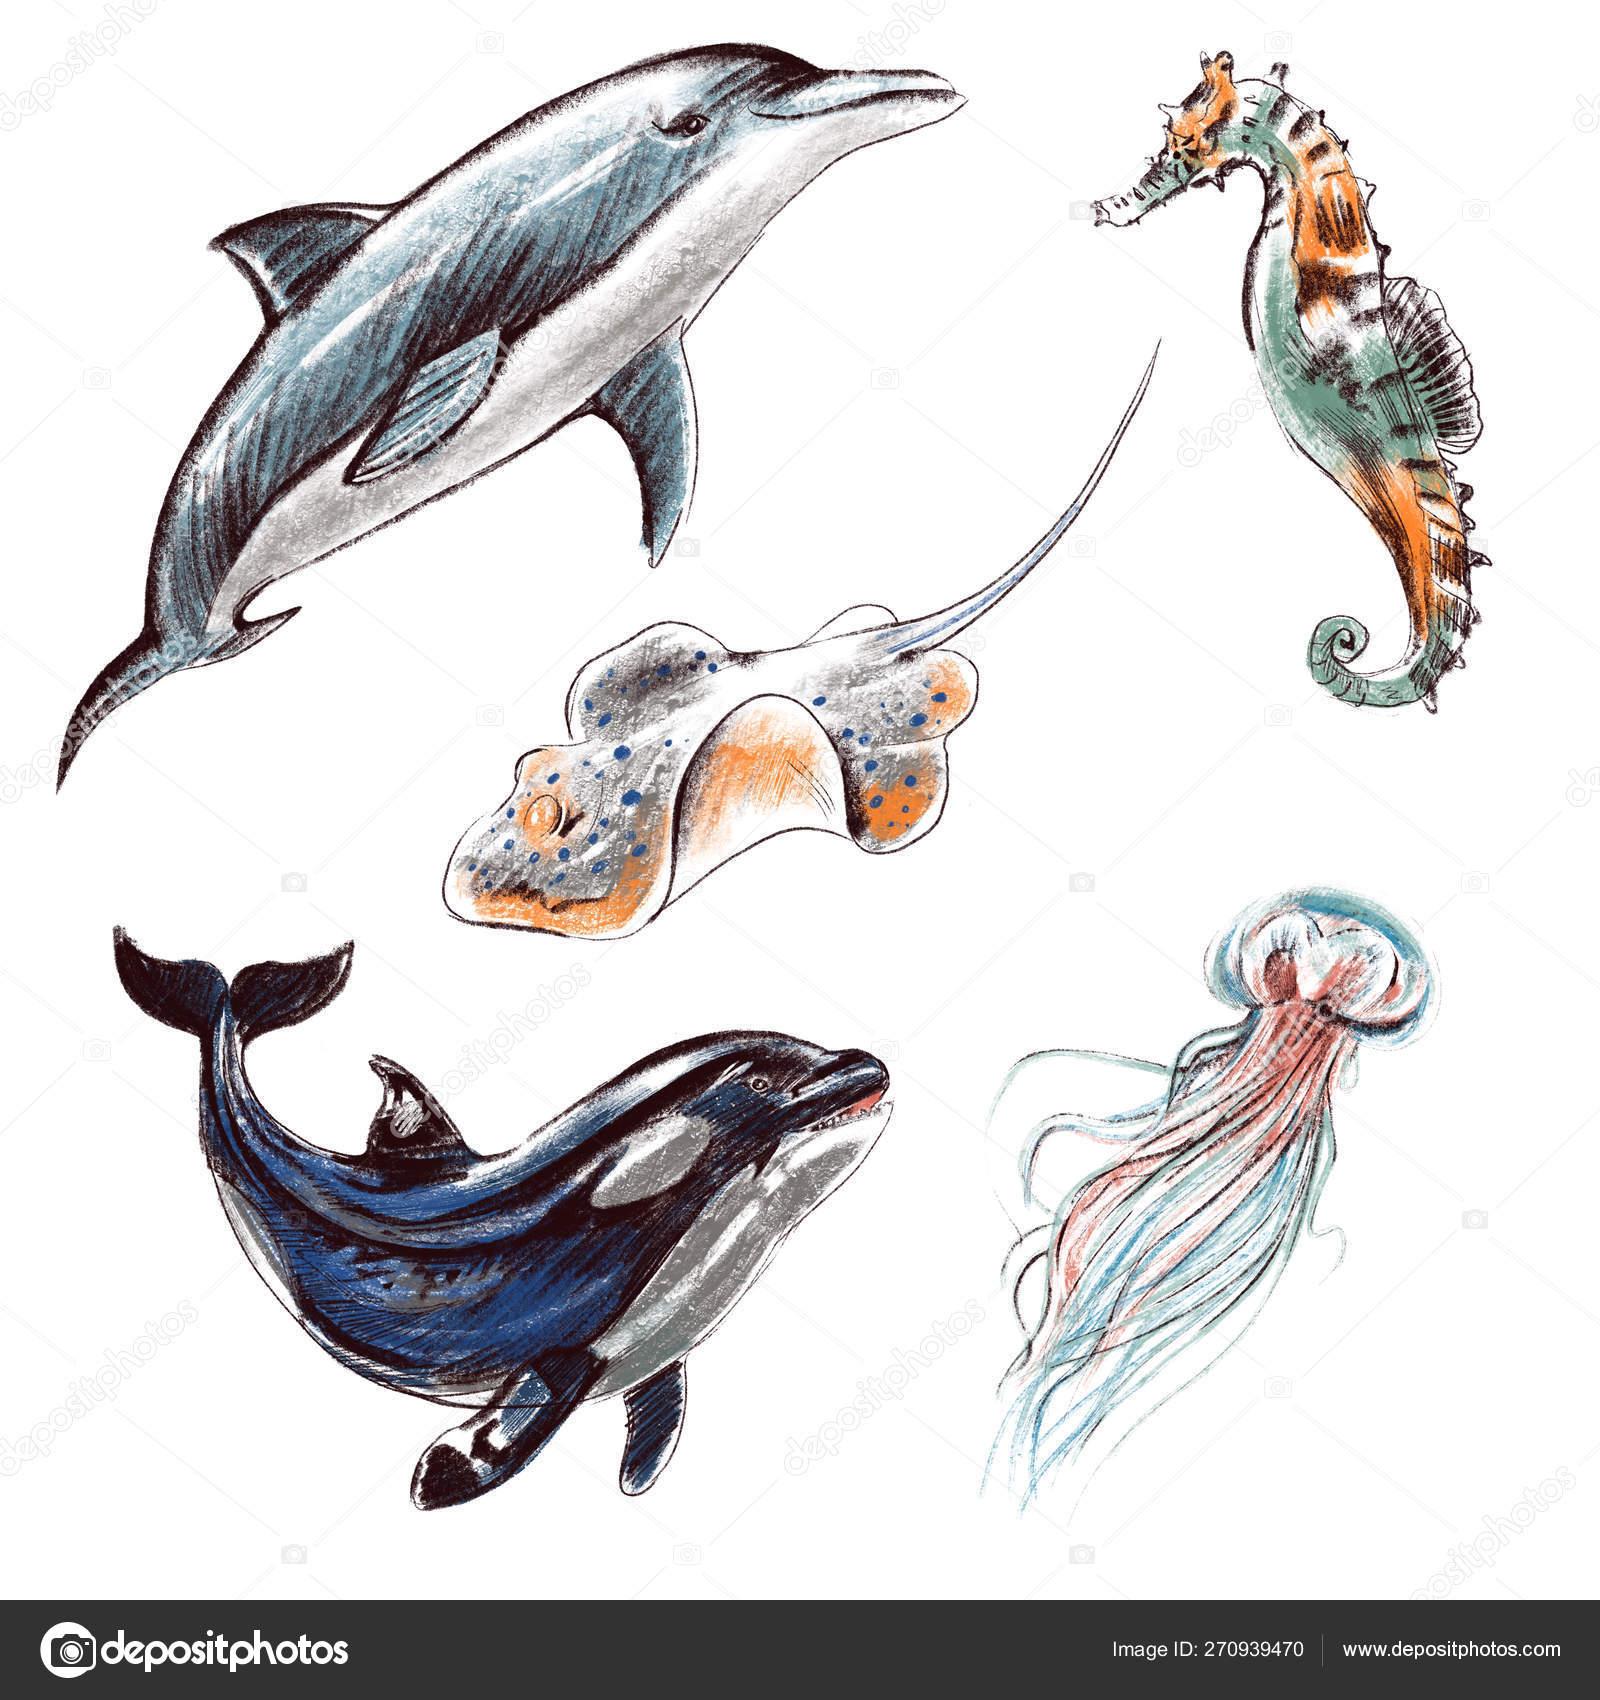 Realistic Jellyfish Drawing Digital Illustration Set Imitating Colored Pencils Realistic Drawing Sea And Ocean Creatures Dolphin Killer Whale Jellyfish Stingray Sea Horse Stock Photo C Irinagorbunovaart 270939470